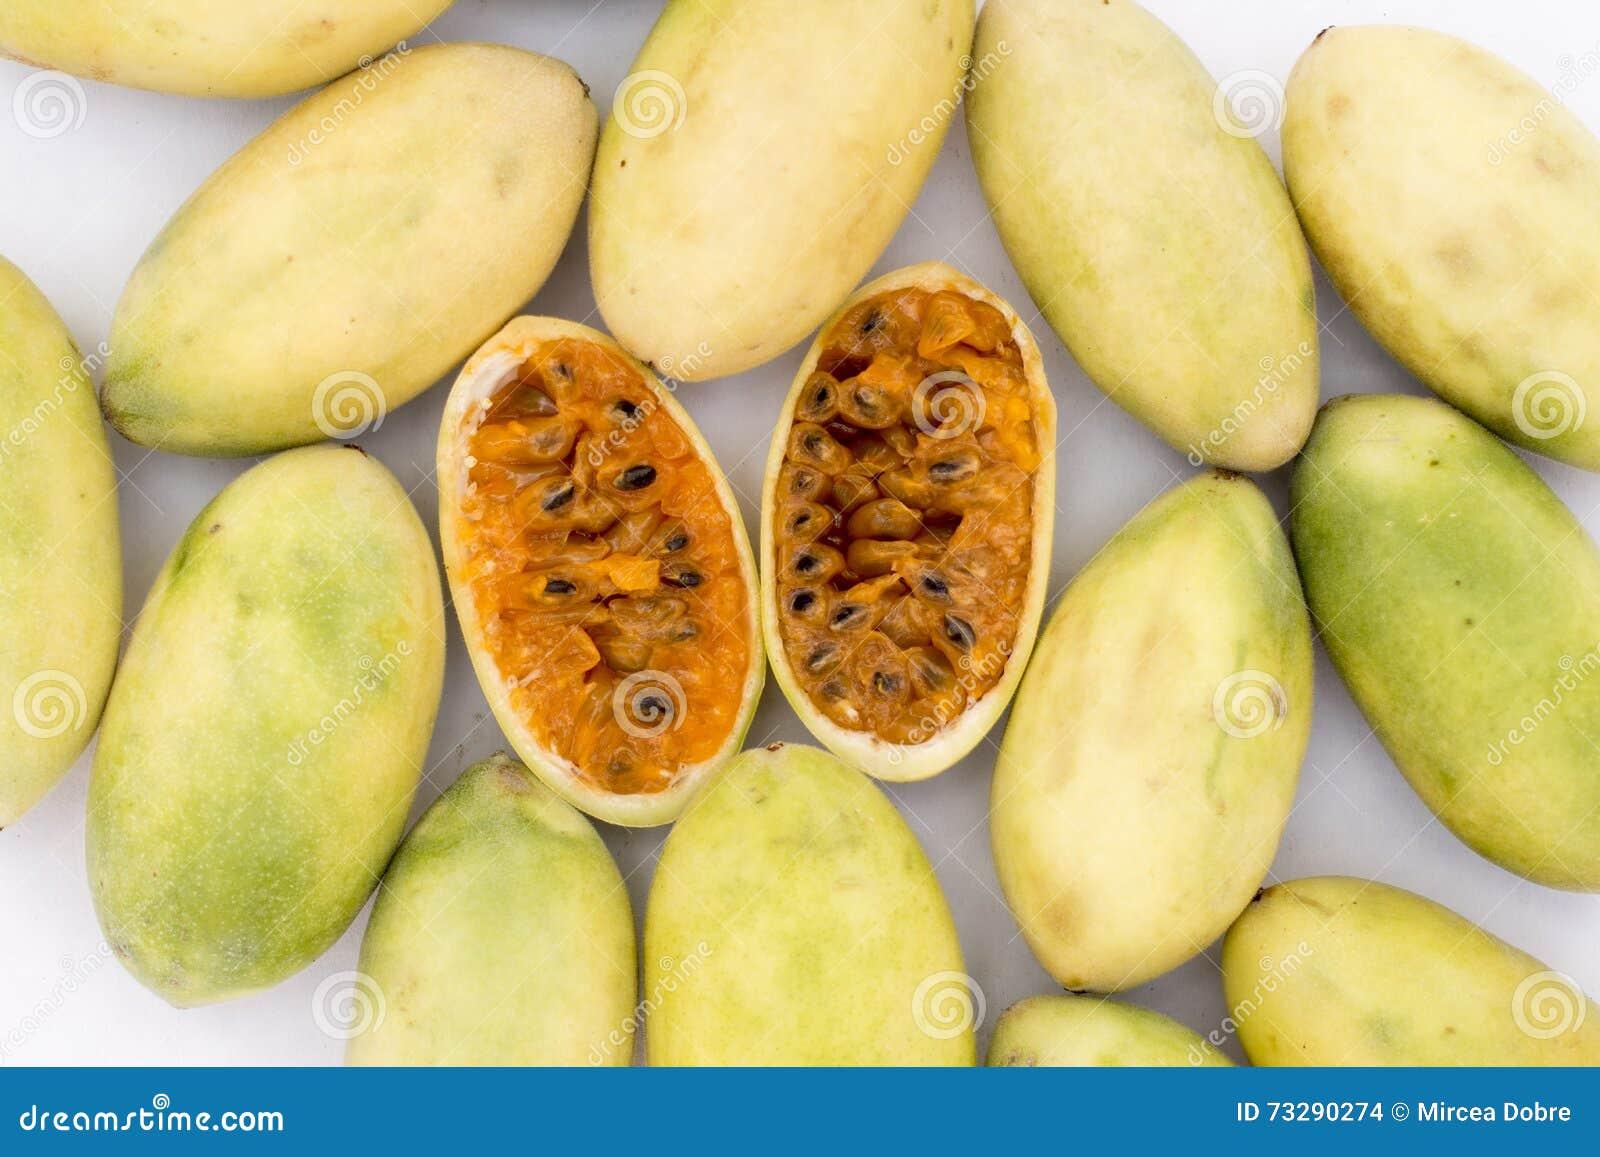 Latijns-Amerikaans fruit genoemd banaan passionfruit (lat Passiebloemtripartita) (in Spaanse meestal tumbo, curuba, taxo